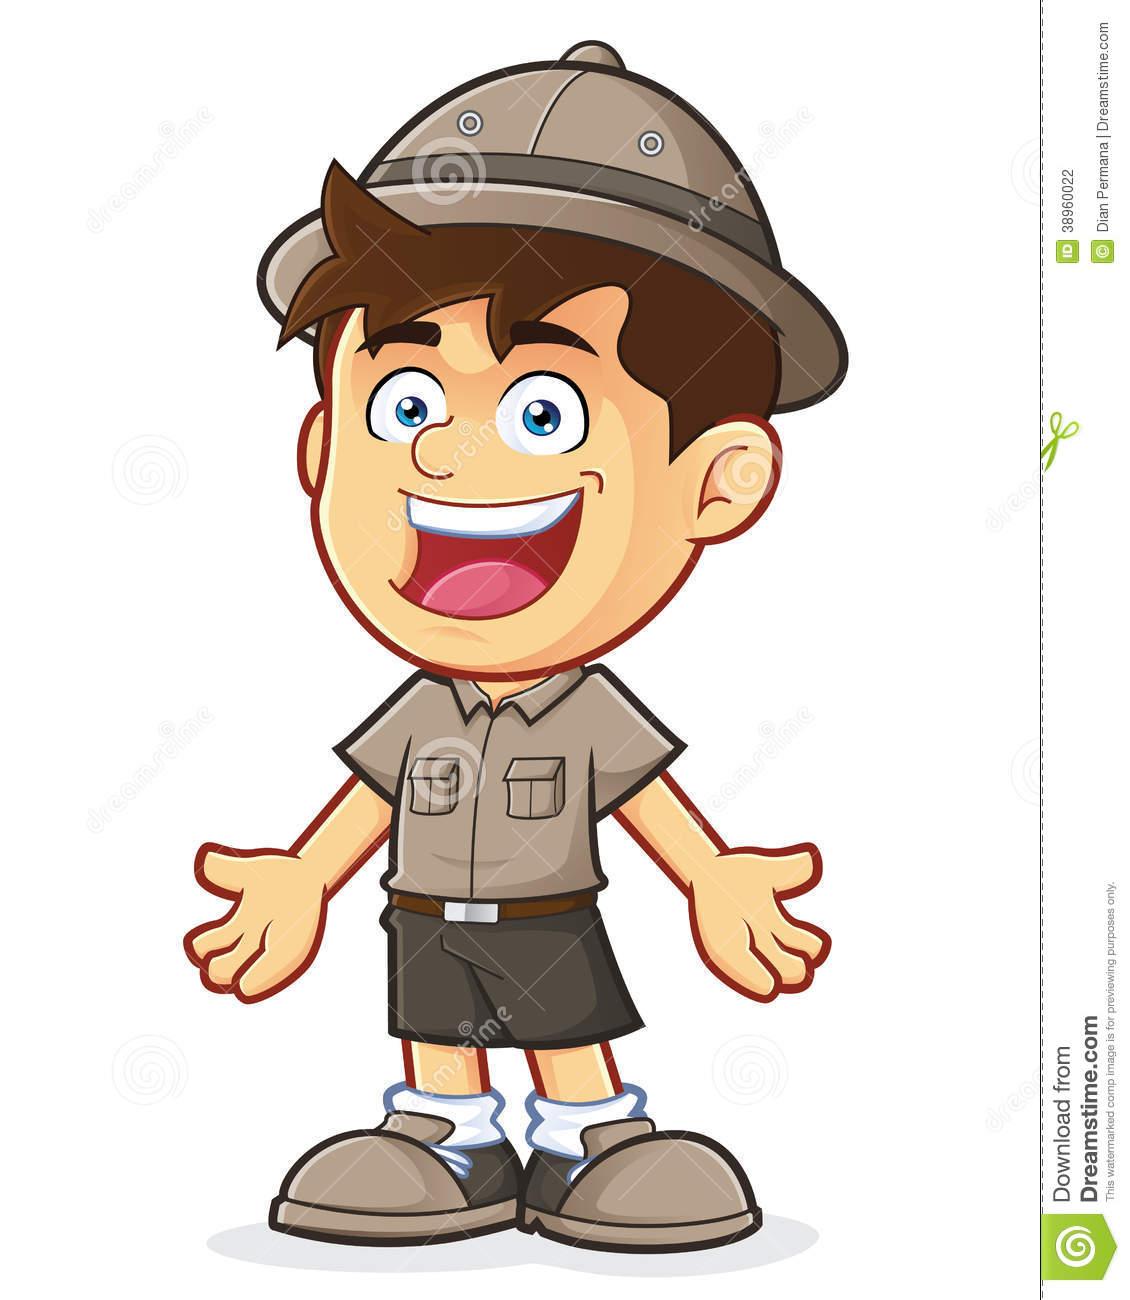 boy-clipart-boy-scout-explorer-boy-welcoming-gesture-vector-clipart ...